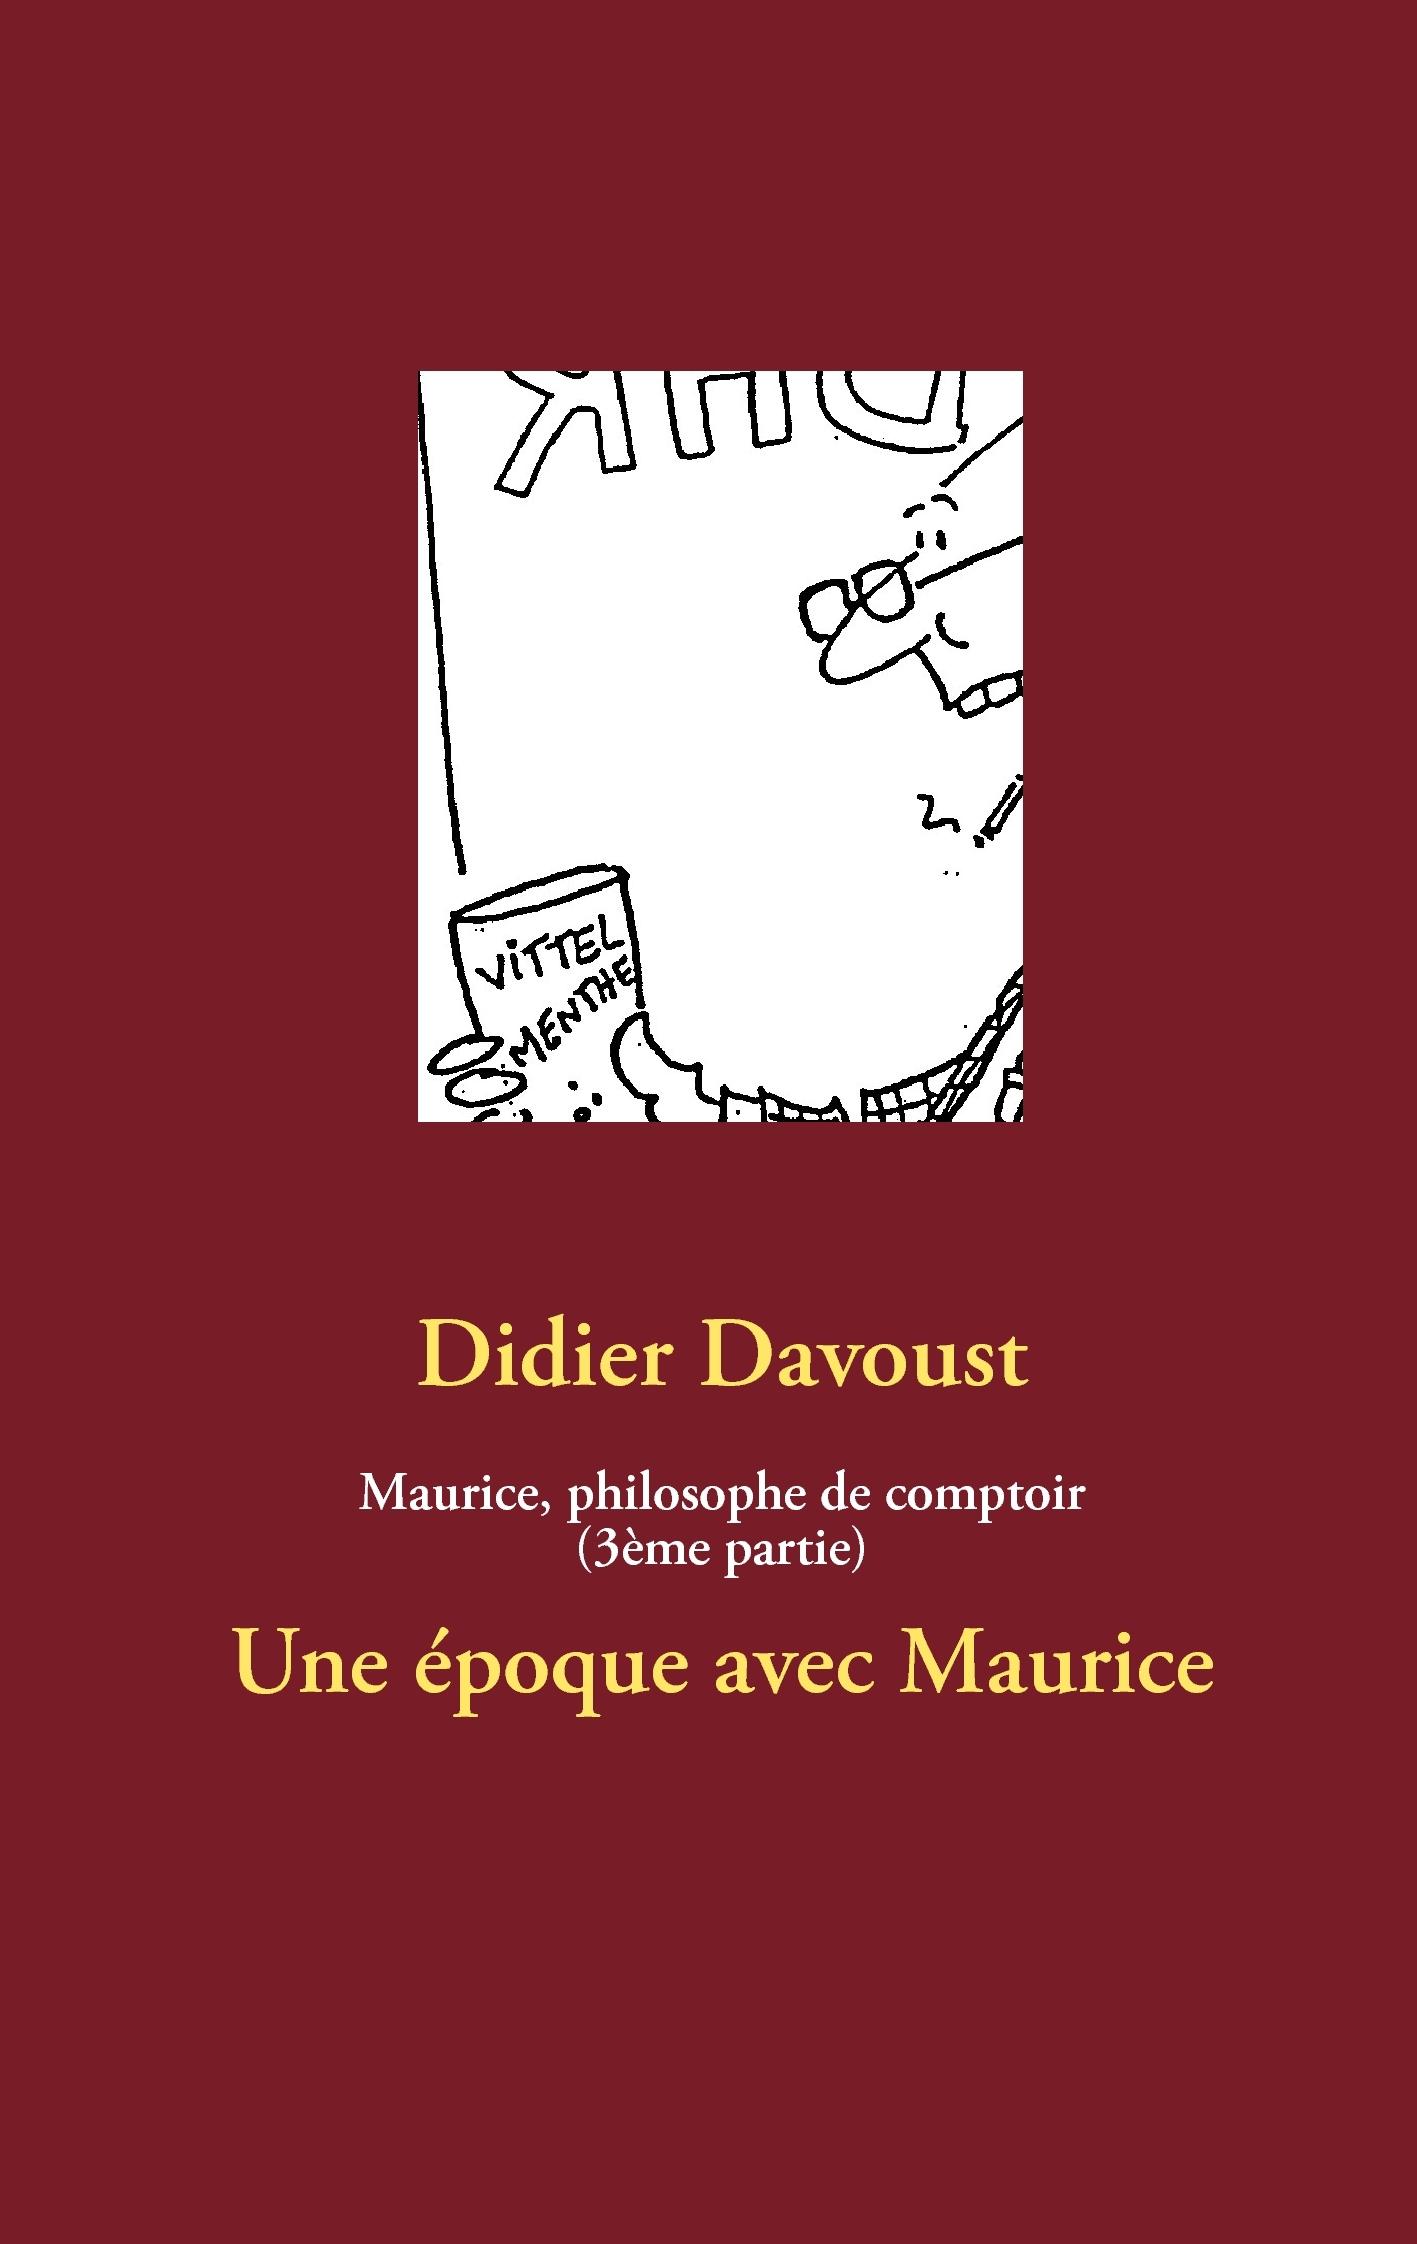 MAURICE PHILOSOPHIE DE COMPTOIR (3EME PARTIE)